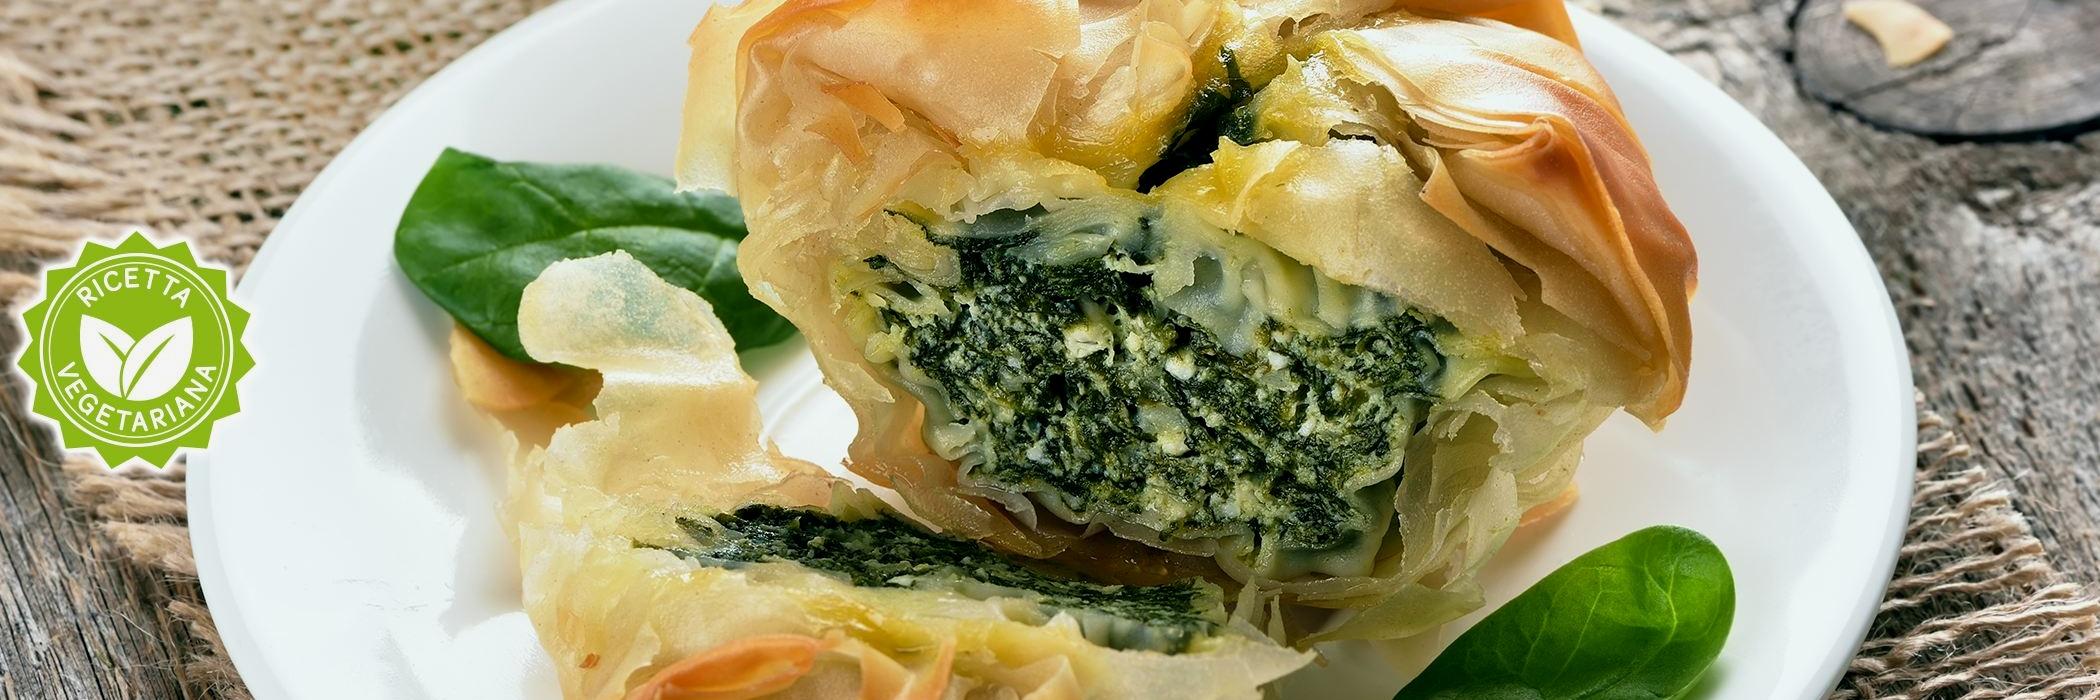 galette salata ricotta e spinaci